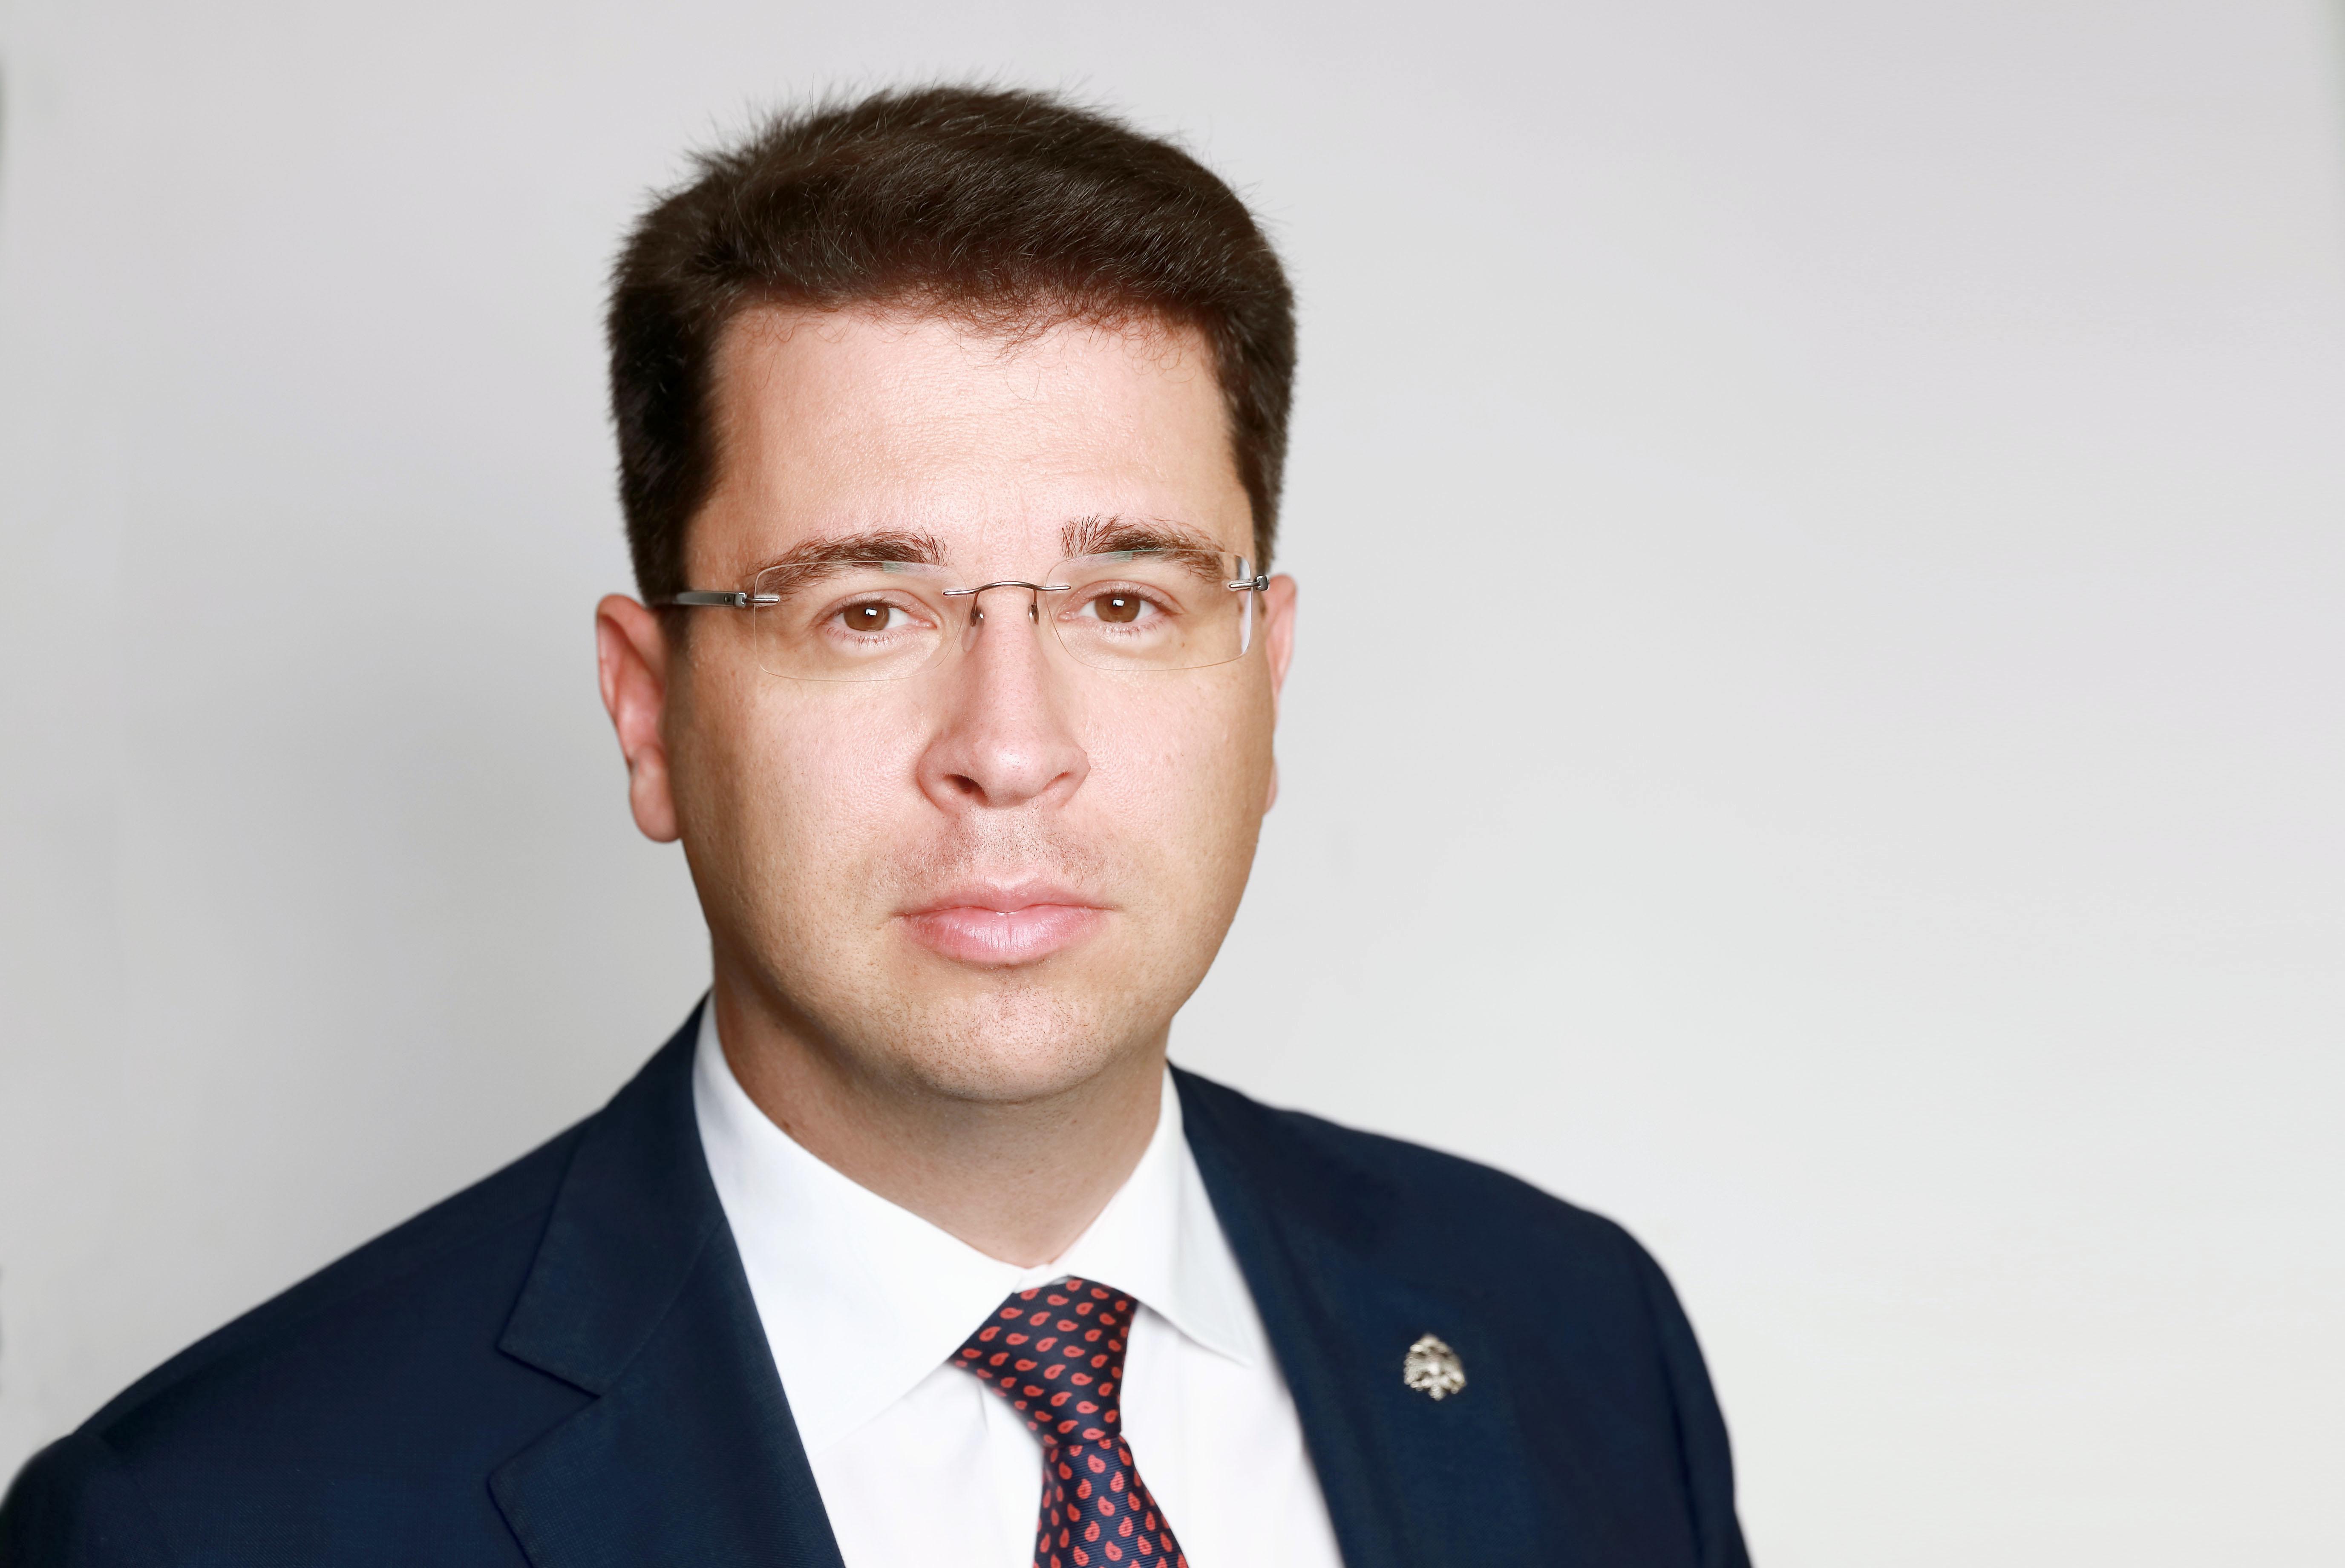 20200916-Новым директором Музея-заповедника назначен Александр Барков-pic1